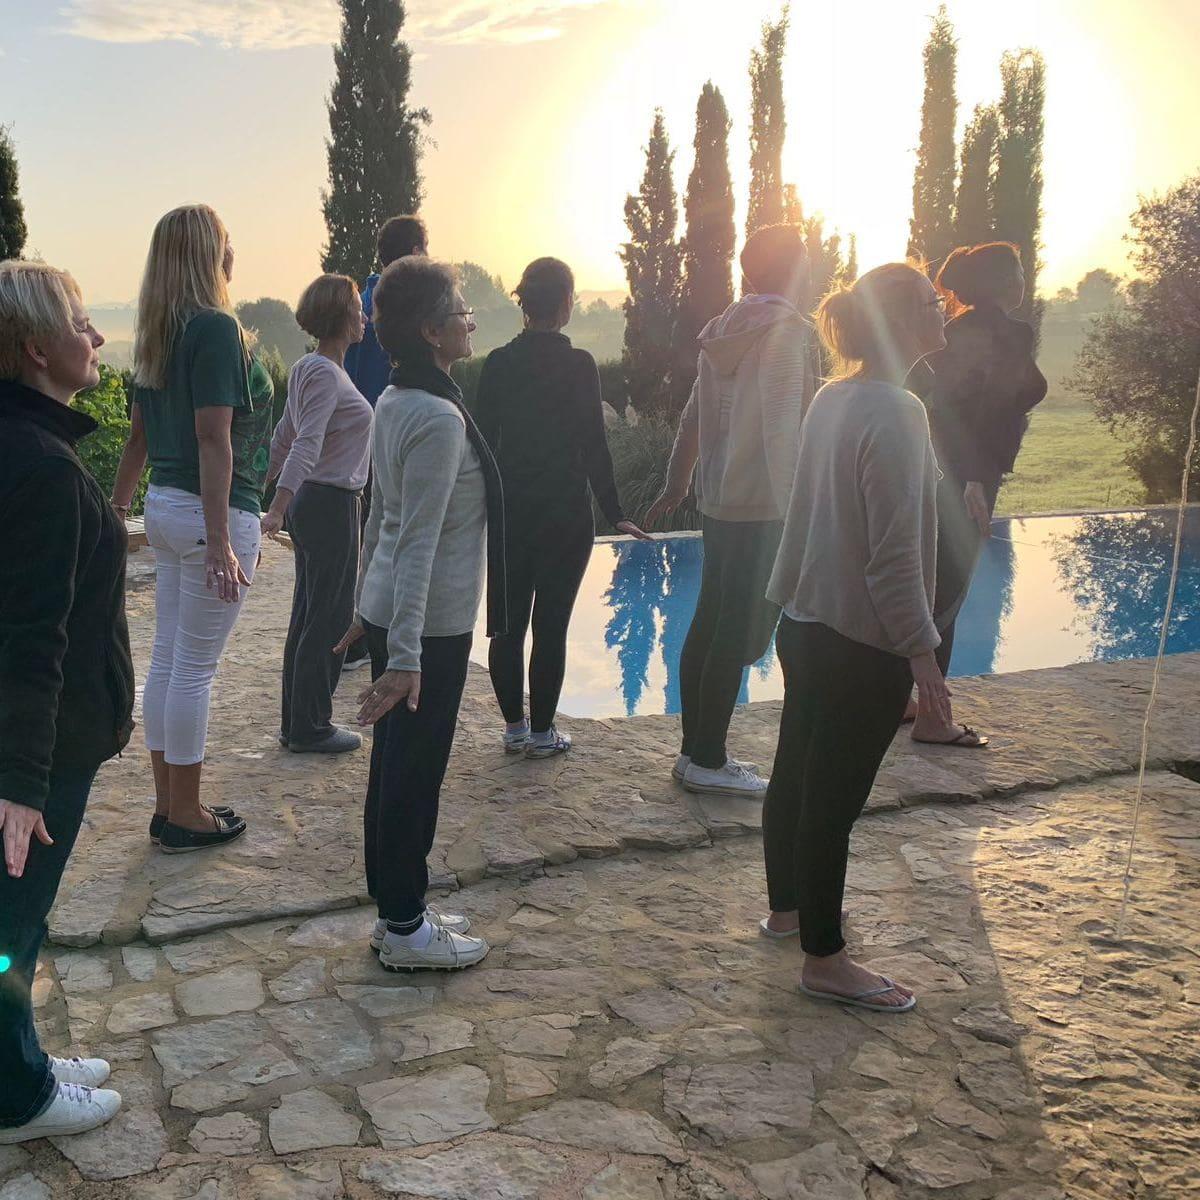 Hypnose lernen: Intensivausbildung zum Hypnose-Coach / Hypnose-Therapeut auf Mallorca